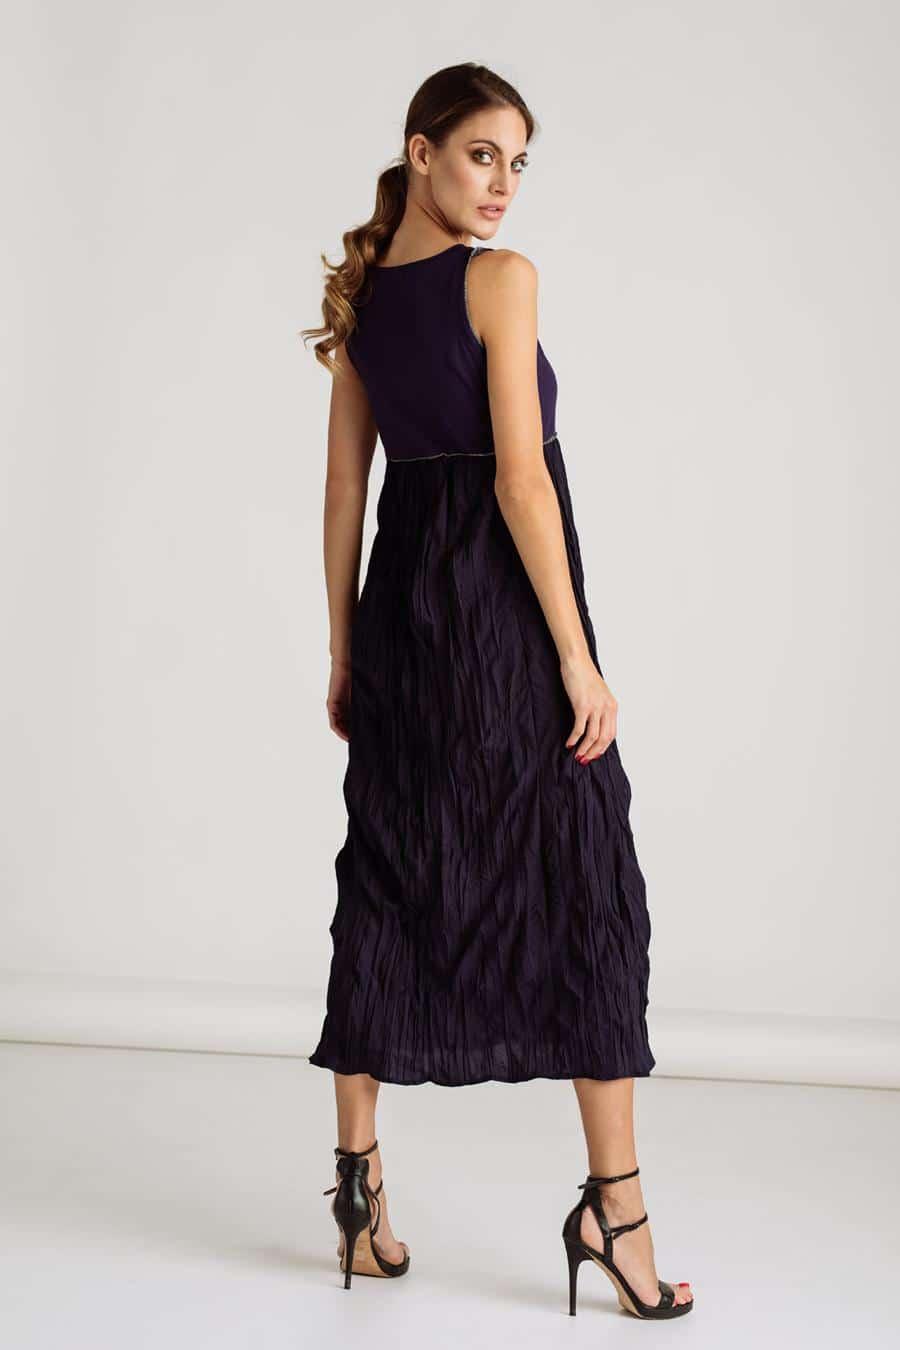 jagger zenska haljina kolekcija prolece leto 2021 ss 2021 kupi online jg 5488 03 2